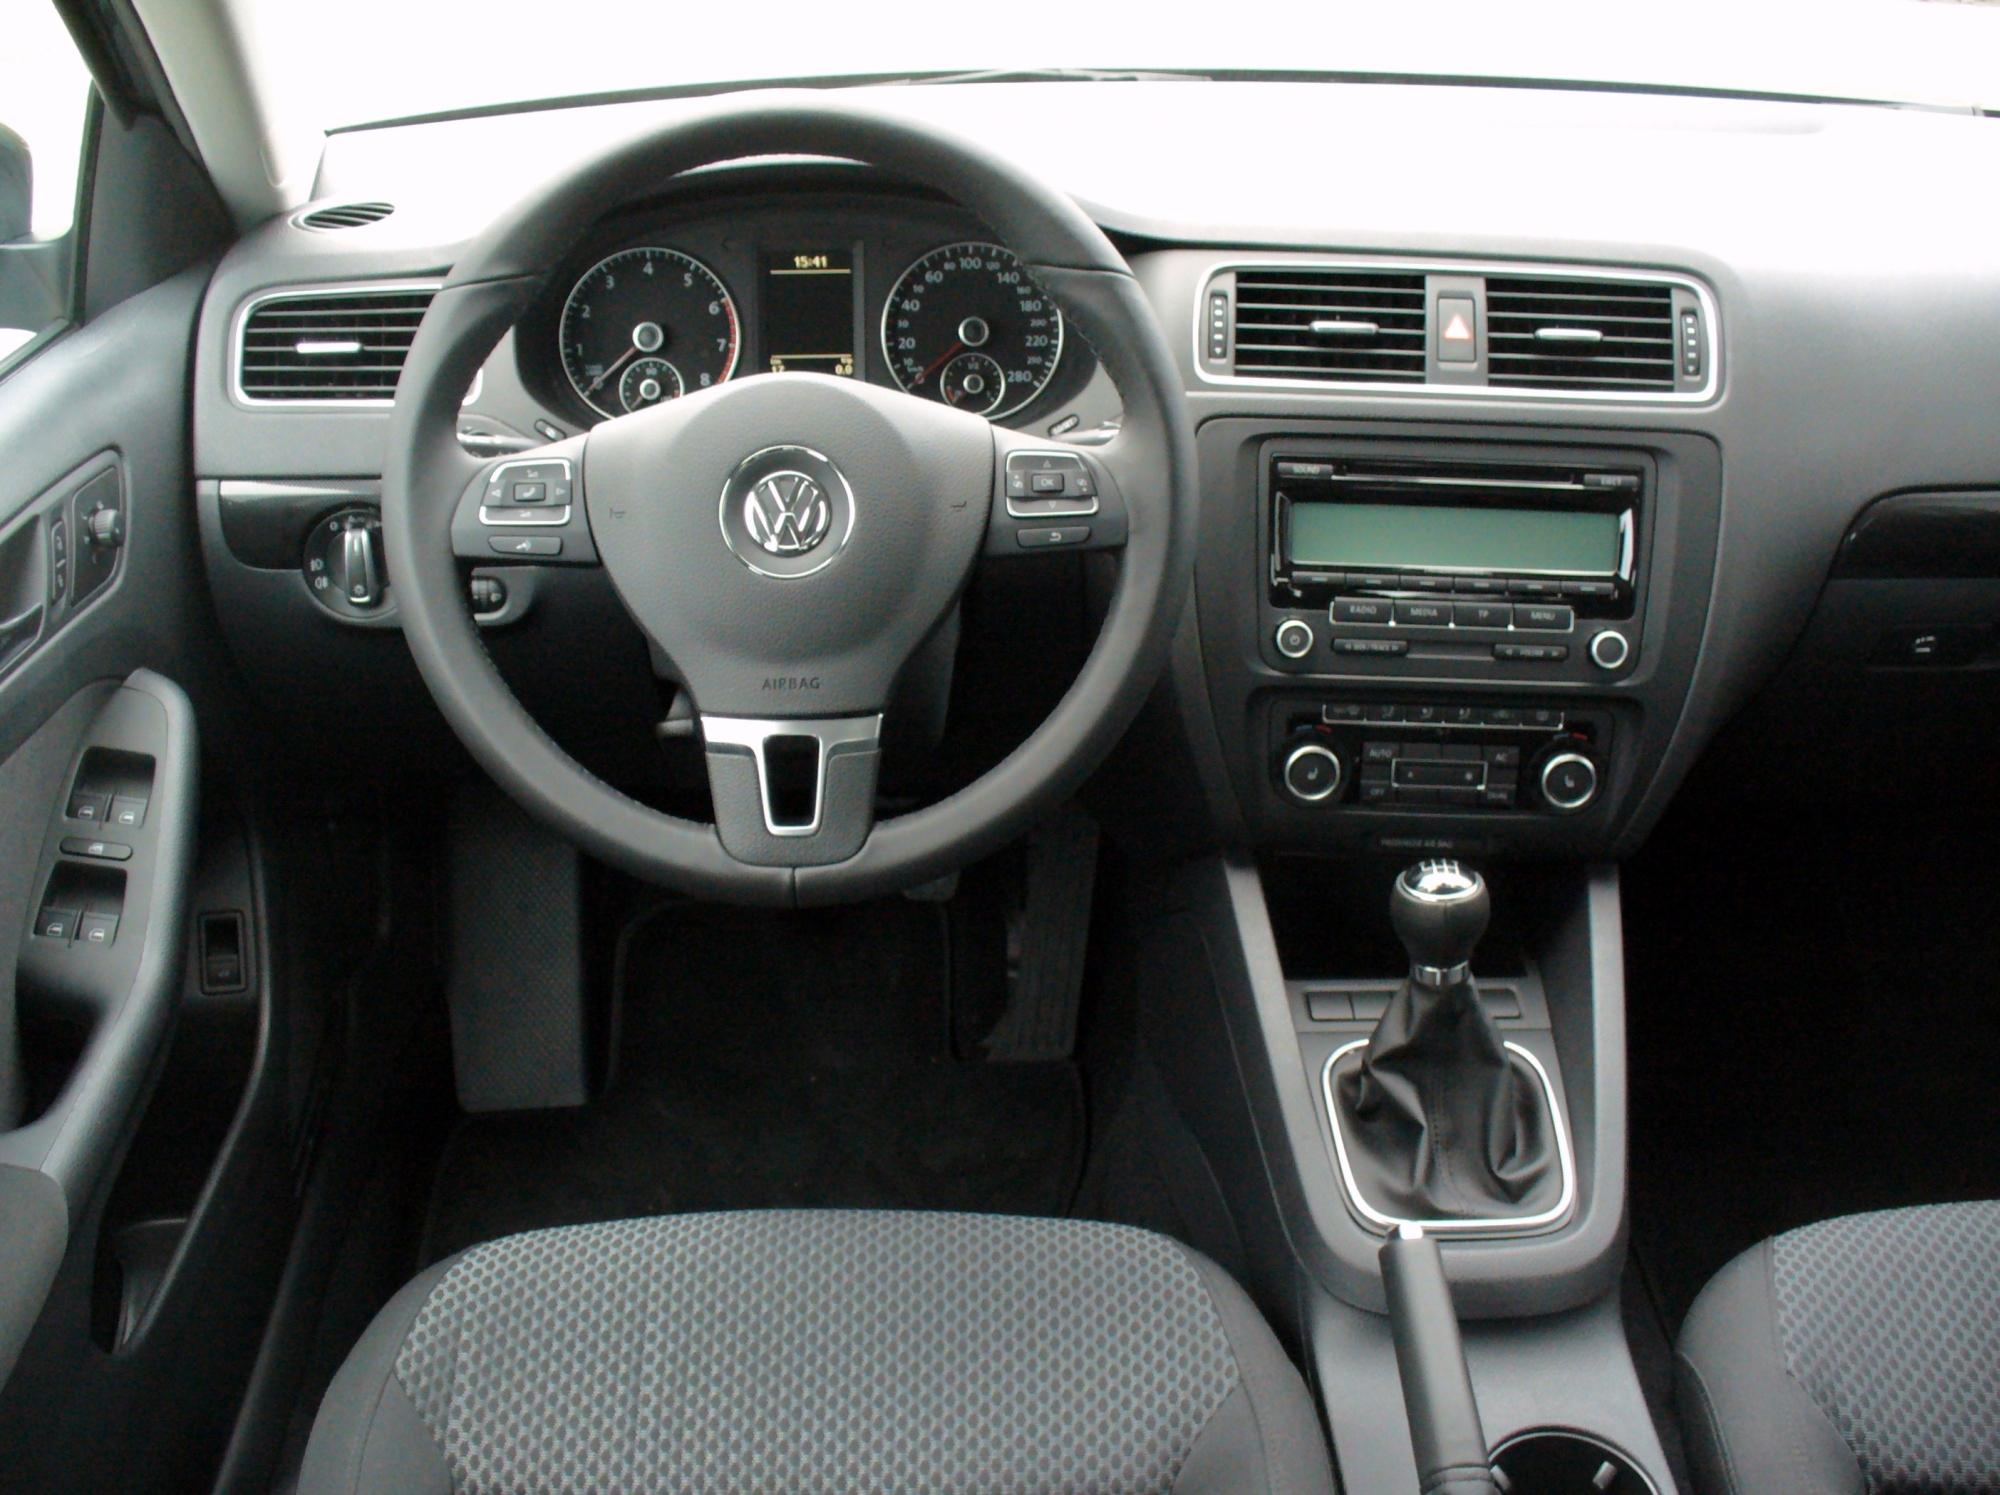 2000 VW Jetta Interior